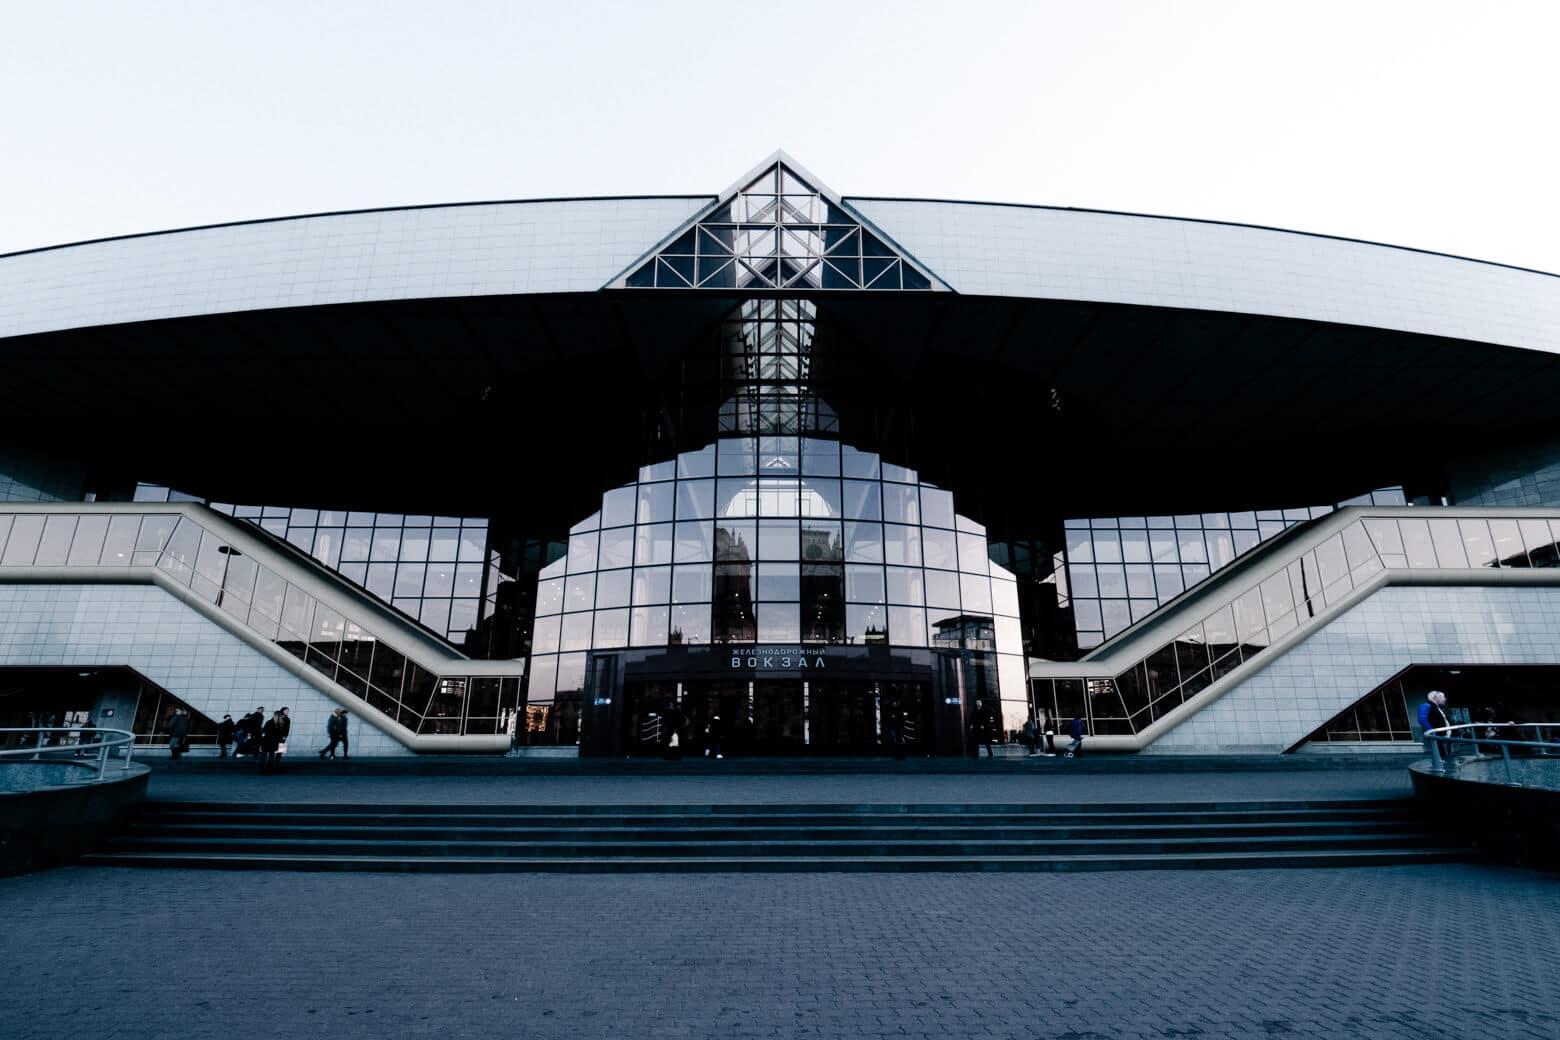 Minsk Main Train Station